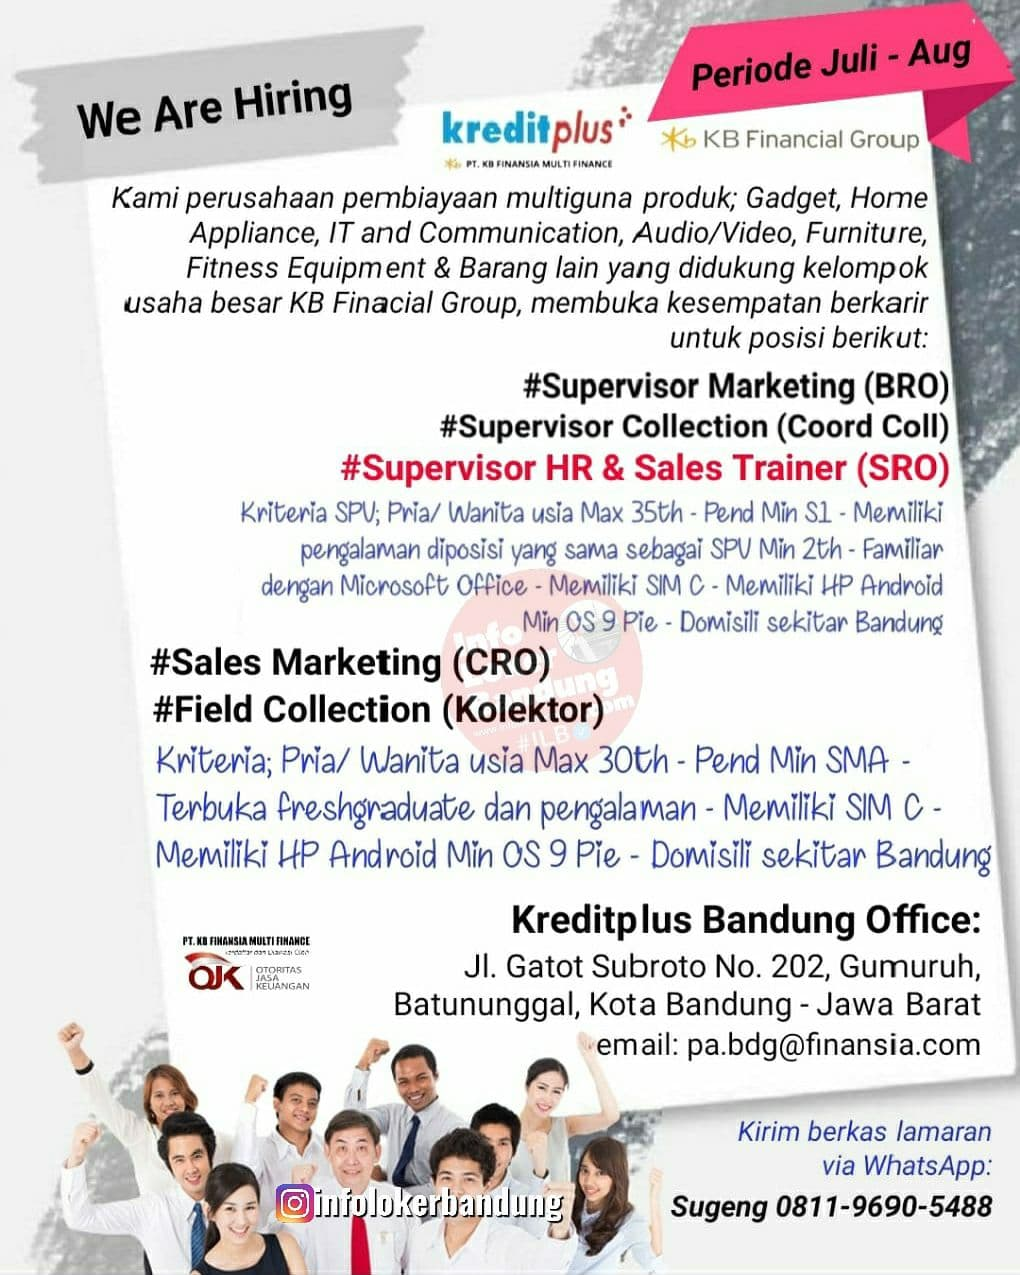 Lowongan Kerja Kreditplus Bandung Juli 2021